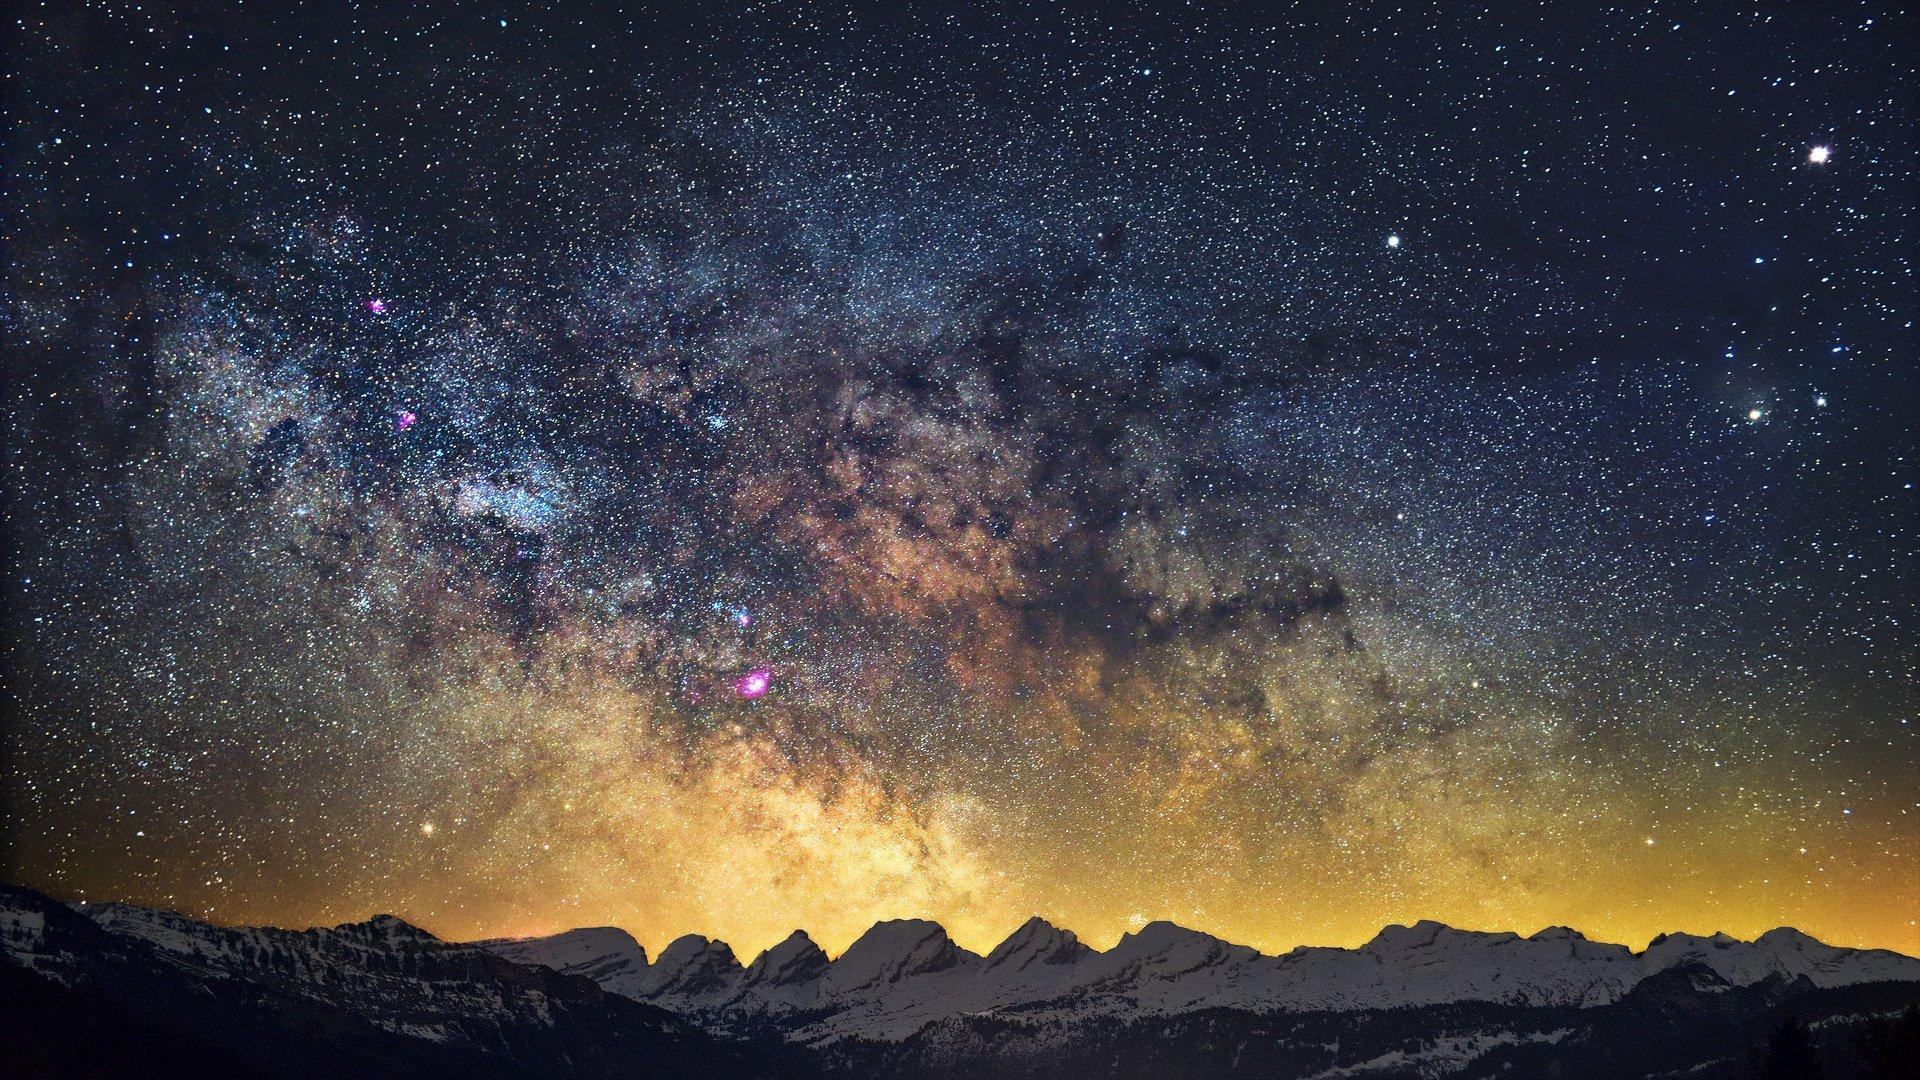 Milky Way Wallpapers HD For Desktop Backgrounds